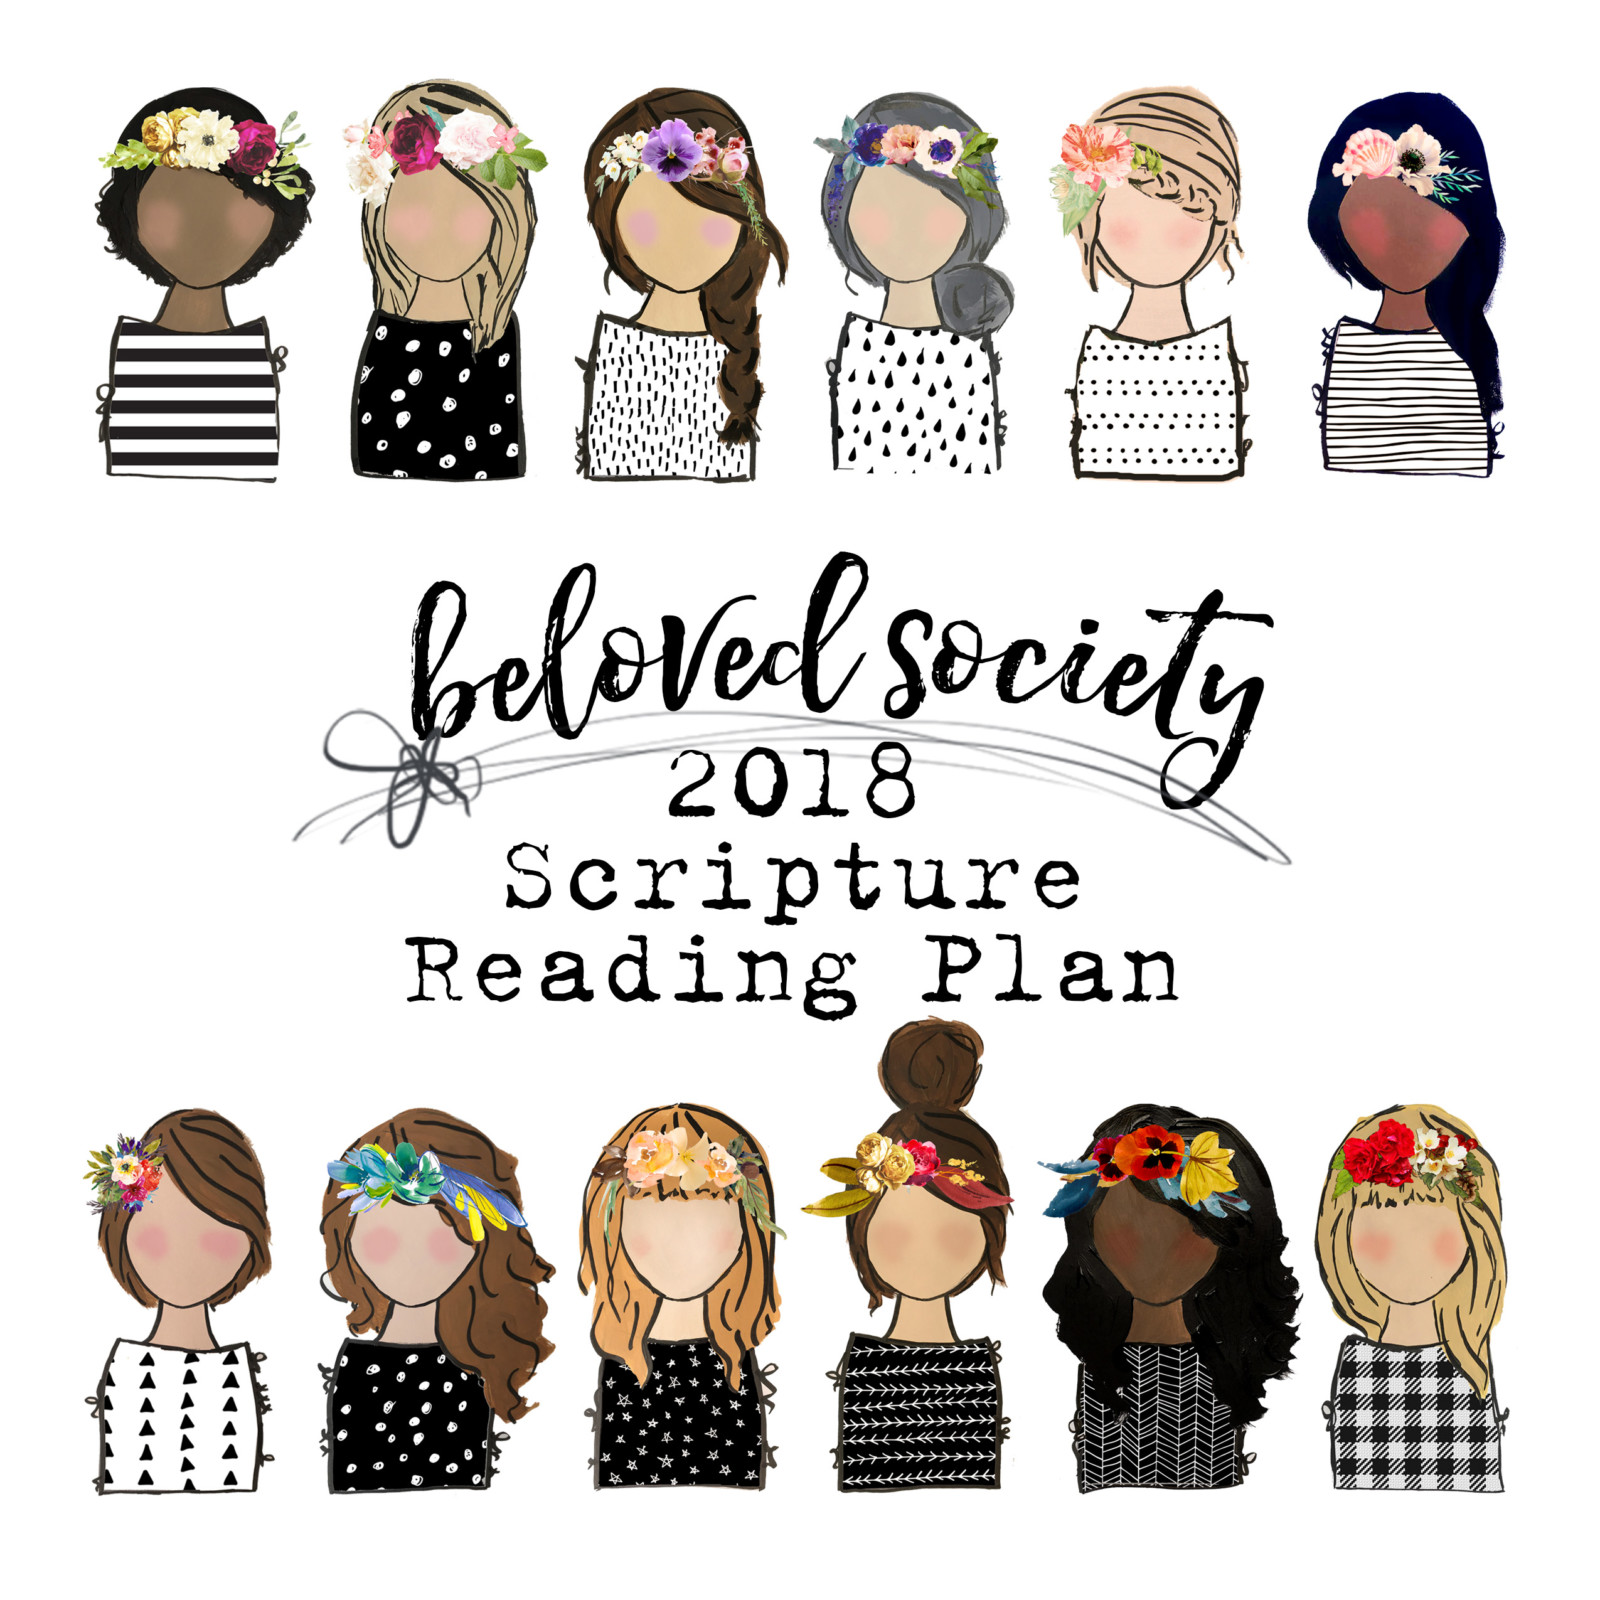 Beloved Society 2018 Scripture Reading Plan